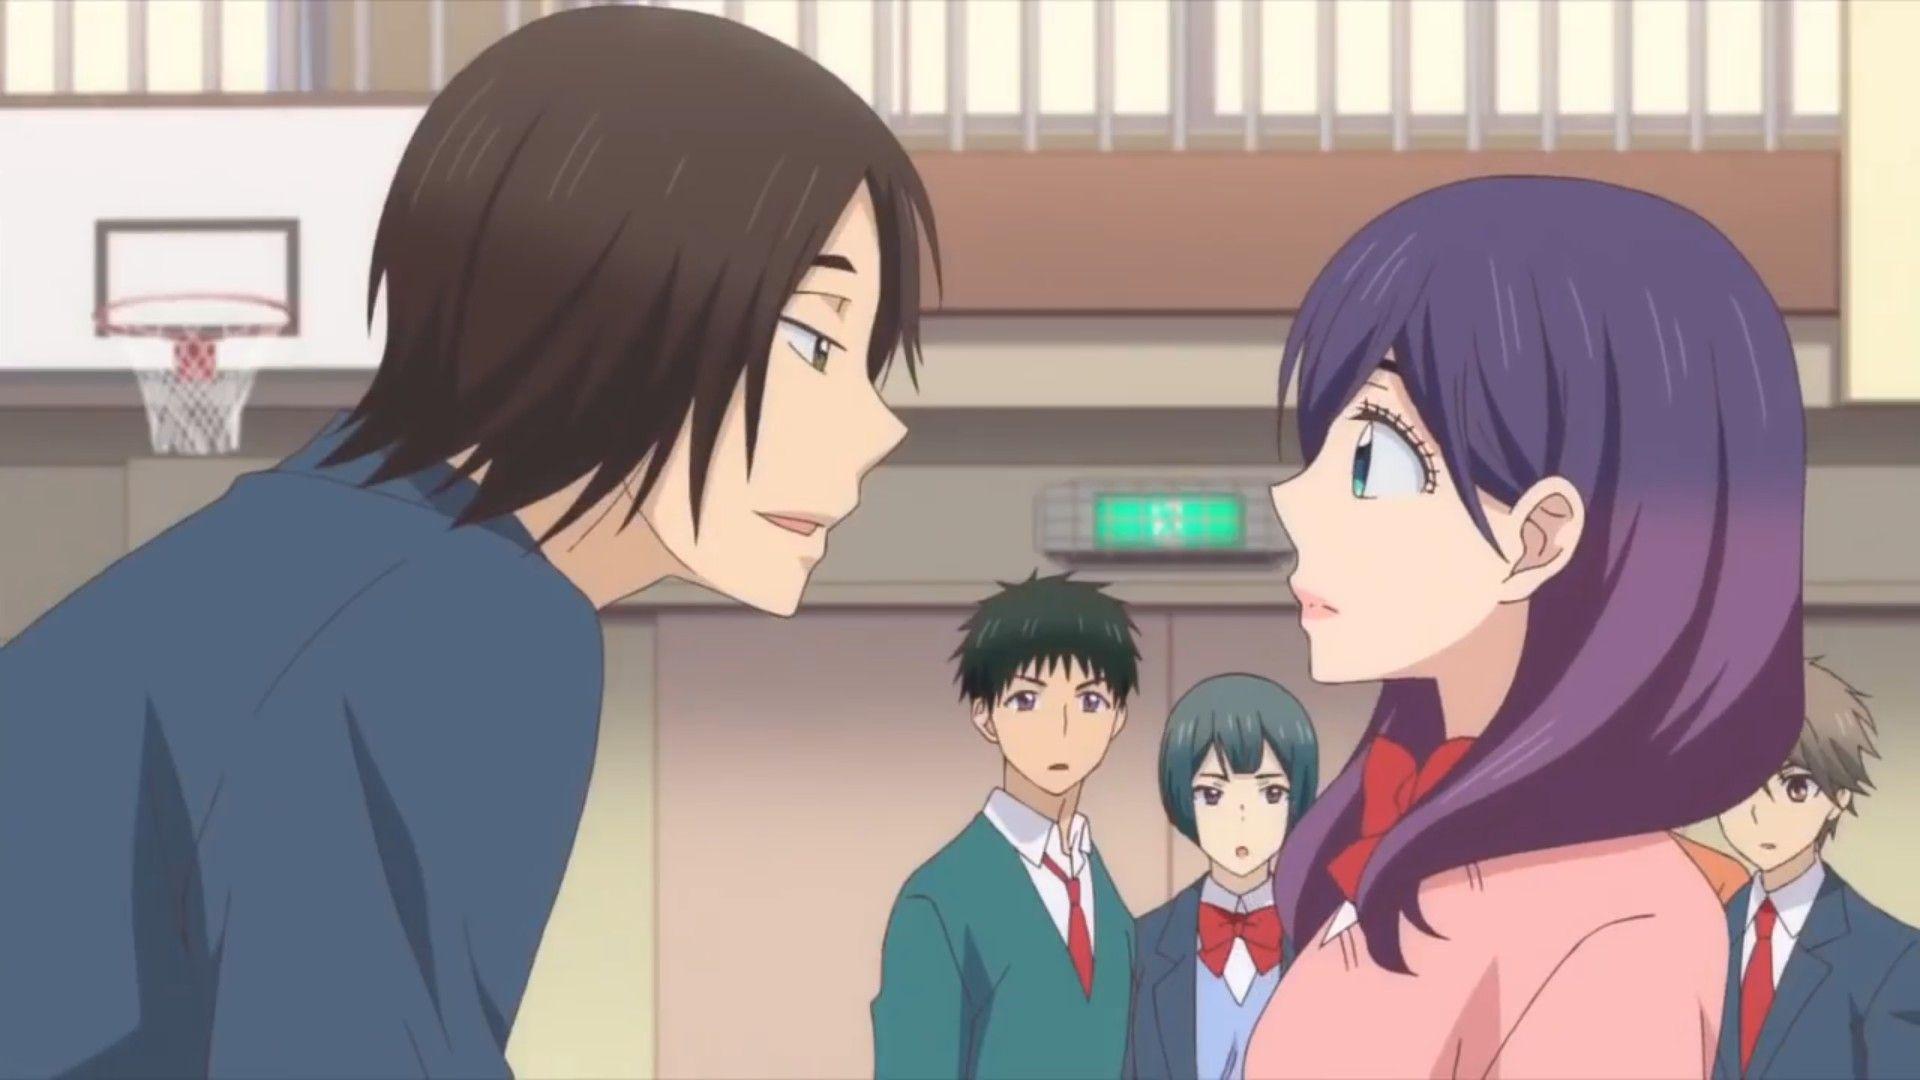 Pin by Lyn`*• on Serinuma kae Anime, Manga anime